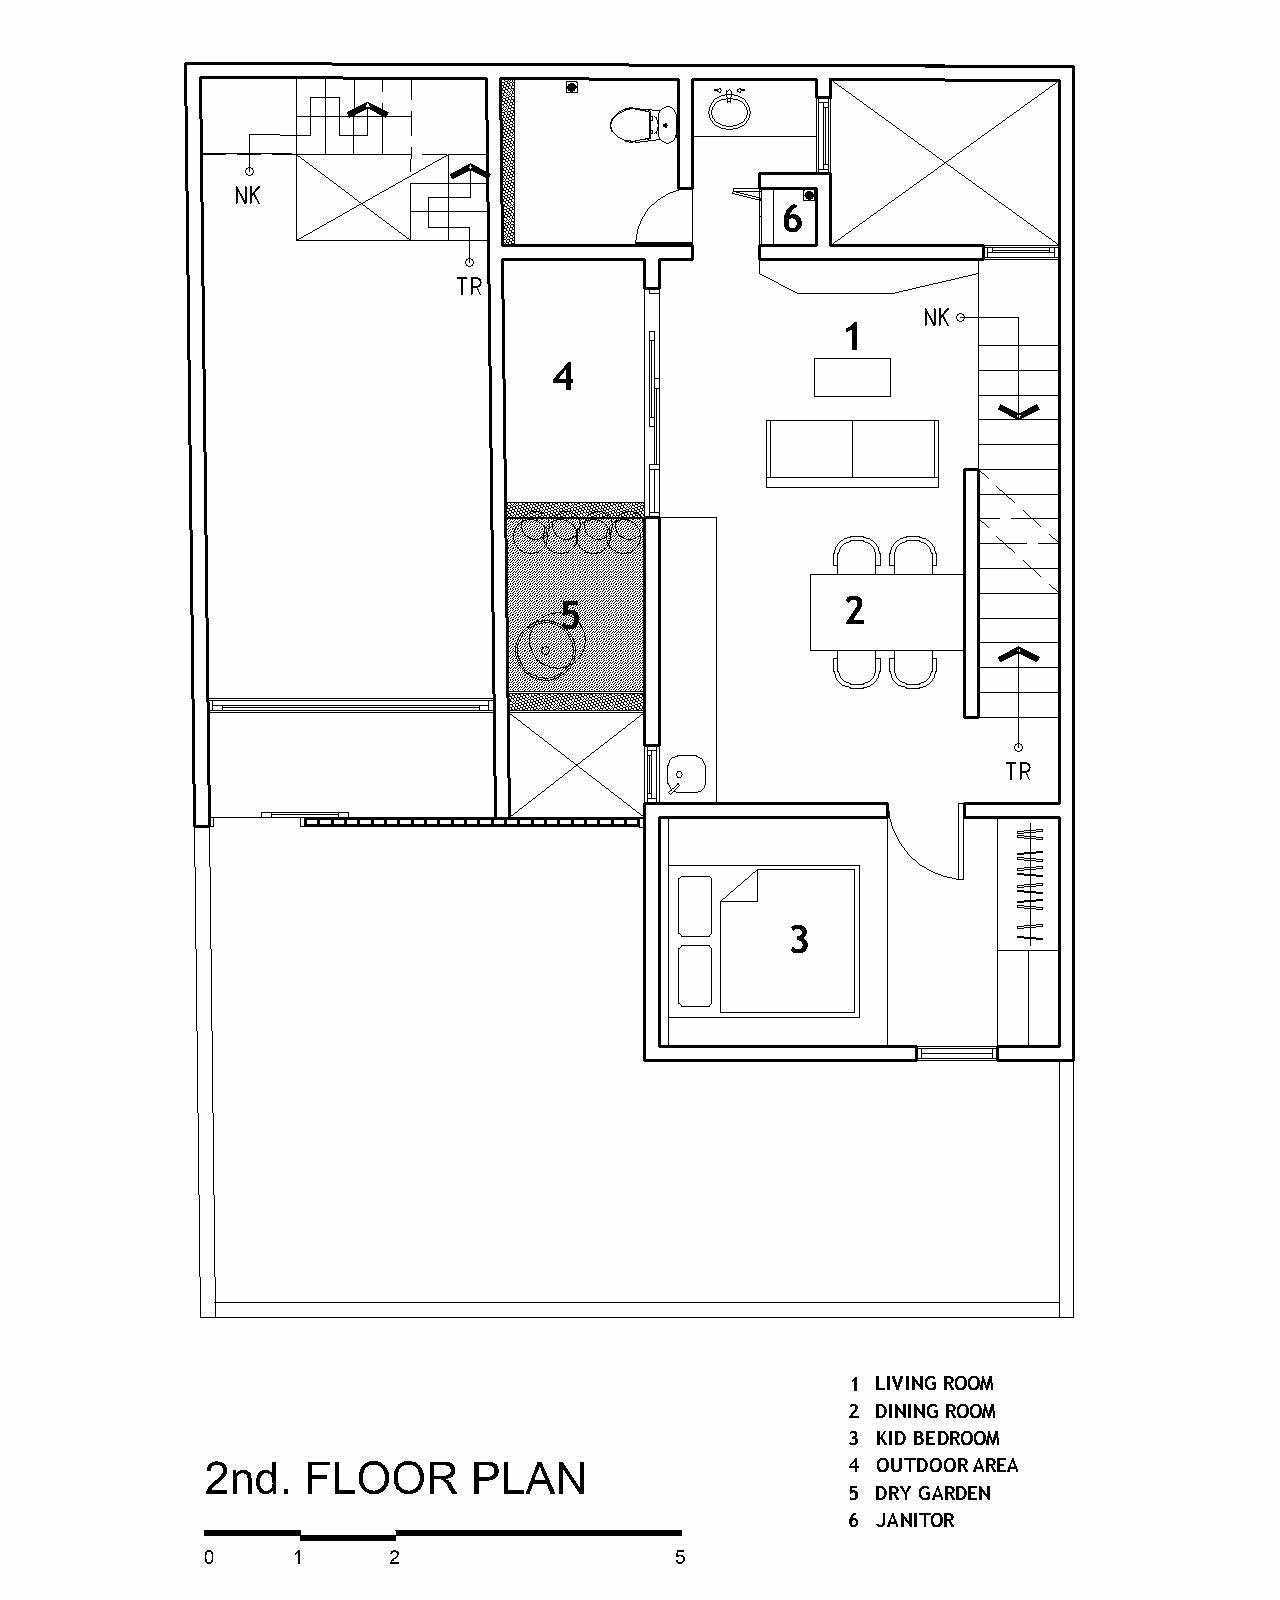 Denah lantai 2 Fitted House karya Bahtera Associates // arsitag.com